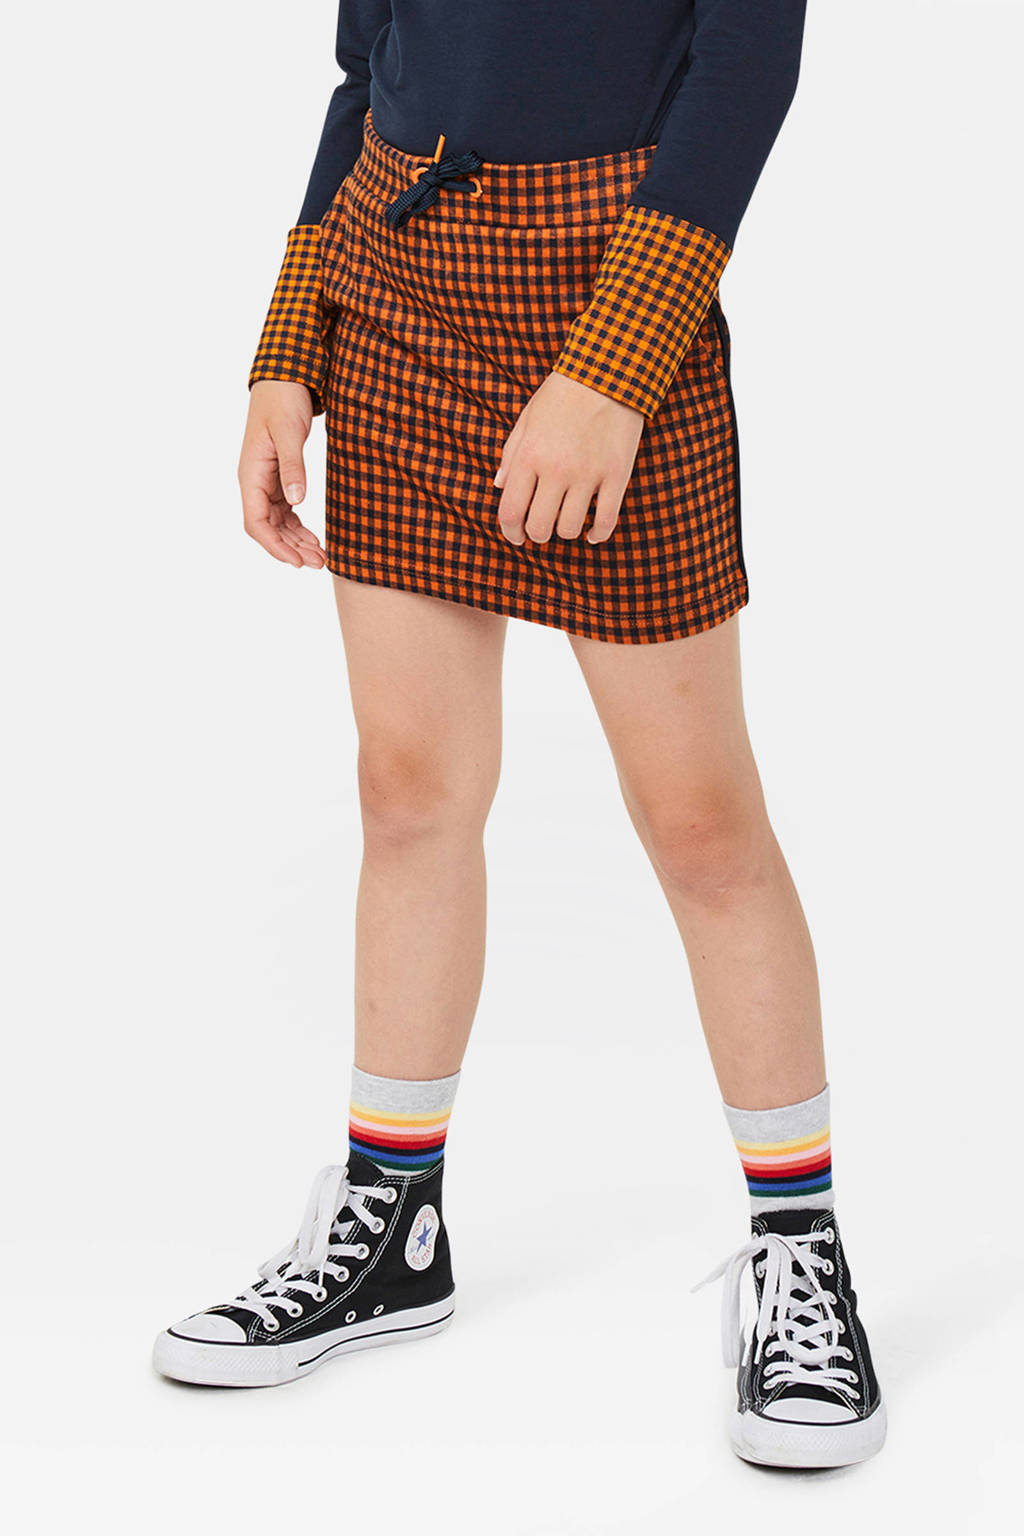 WE Fashion geruite rok oranje/zwart, Oranje/zwart